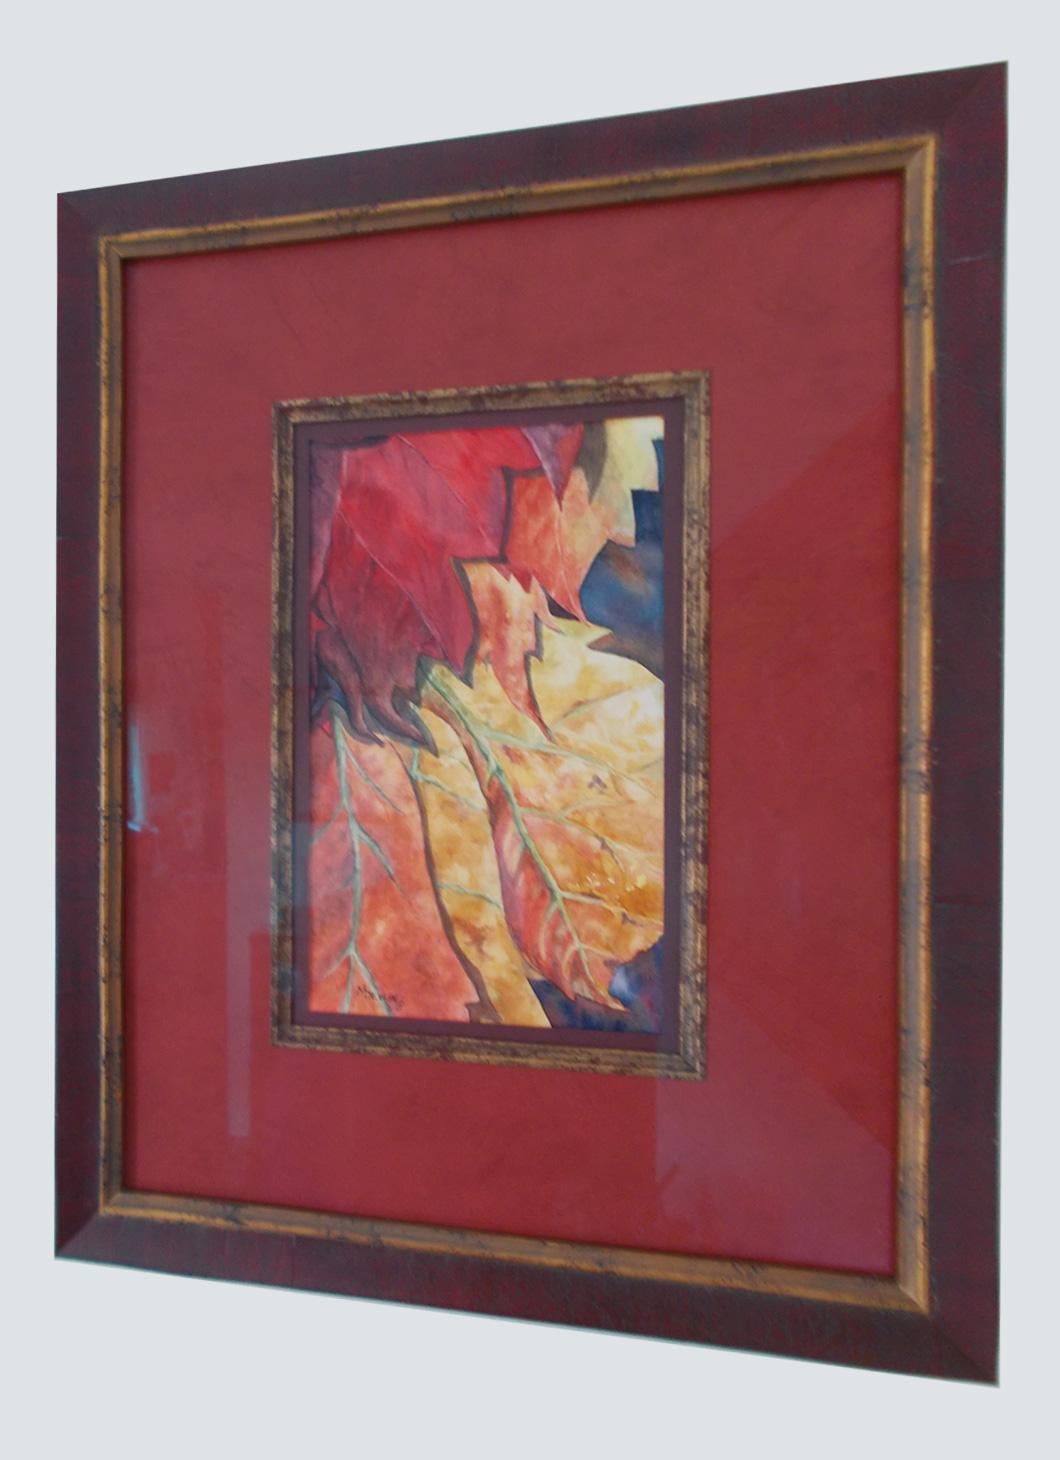 framed watercolor of leaves